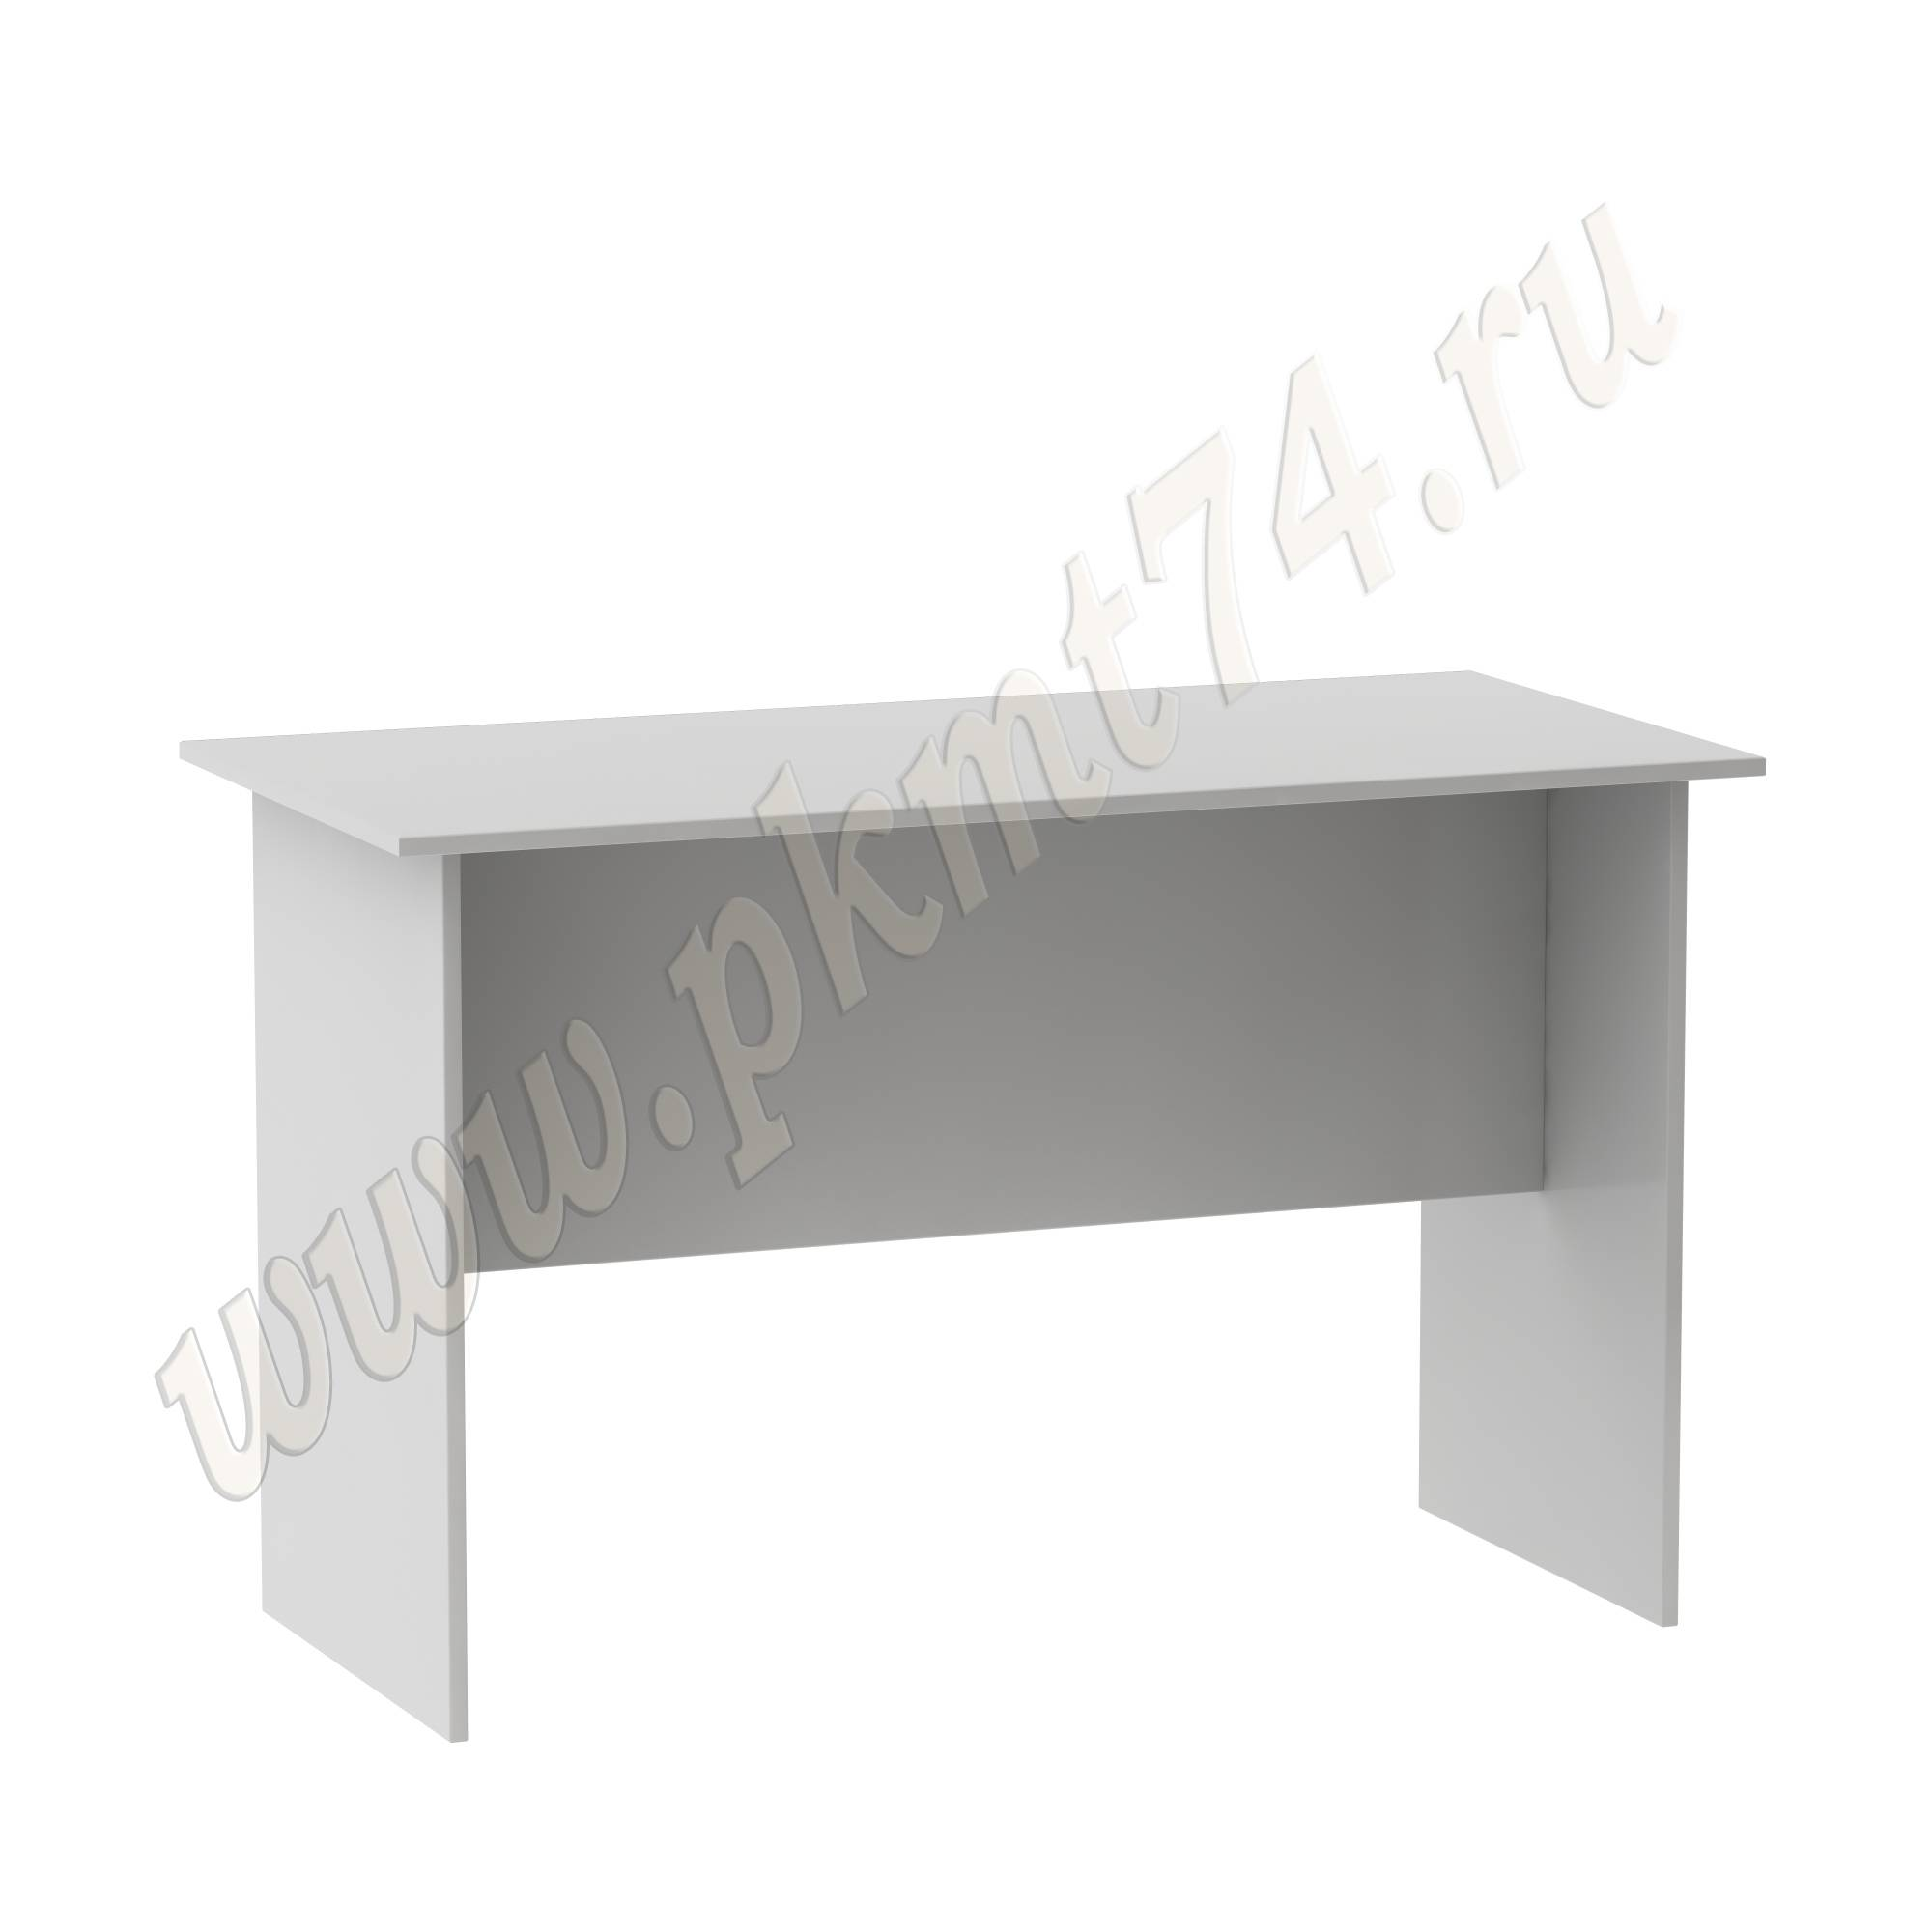 Приставка к столу врача [Цвет ЛДСП:: Серый]